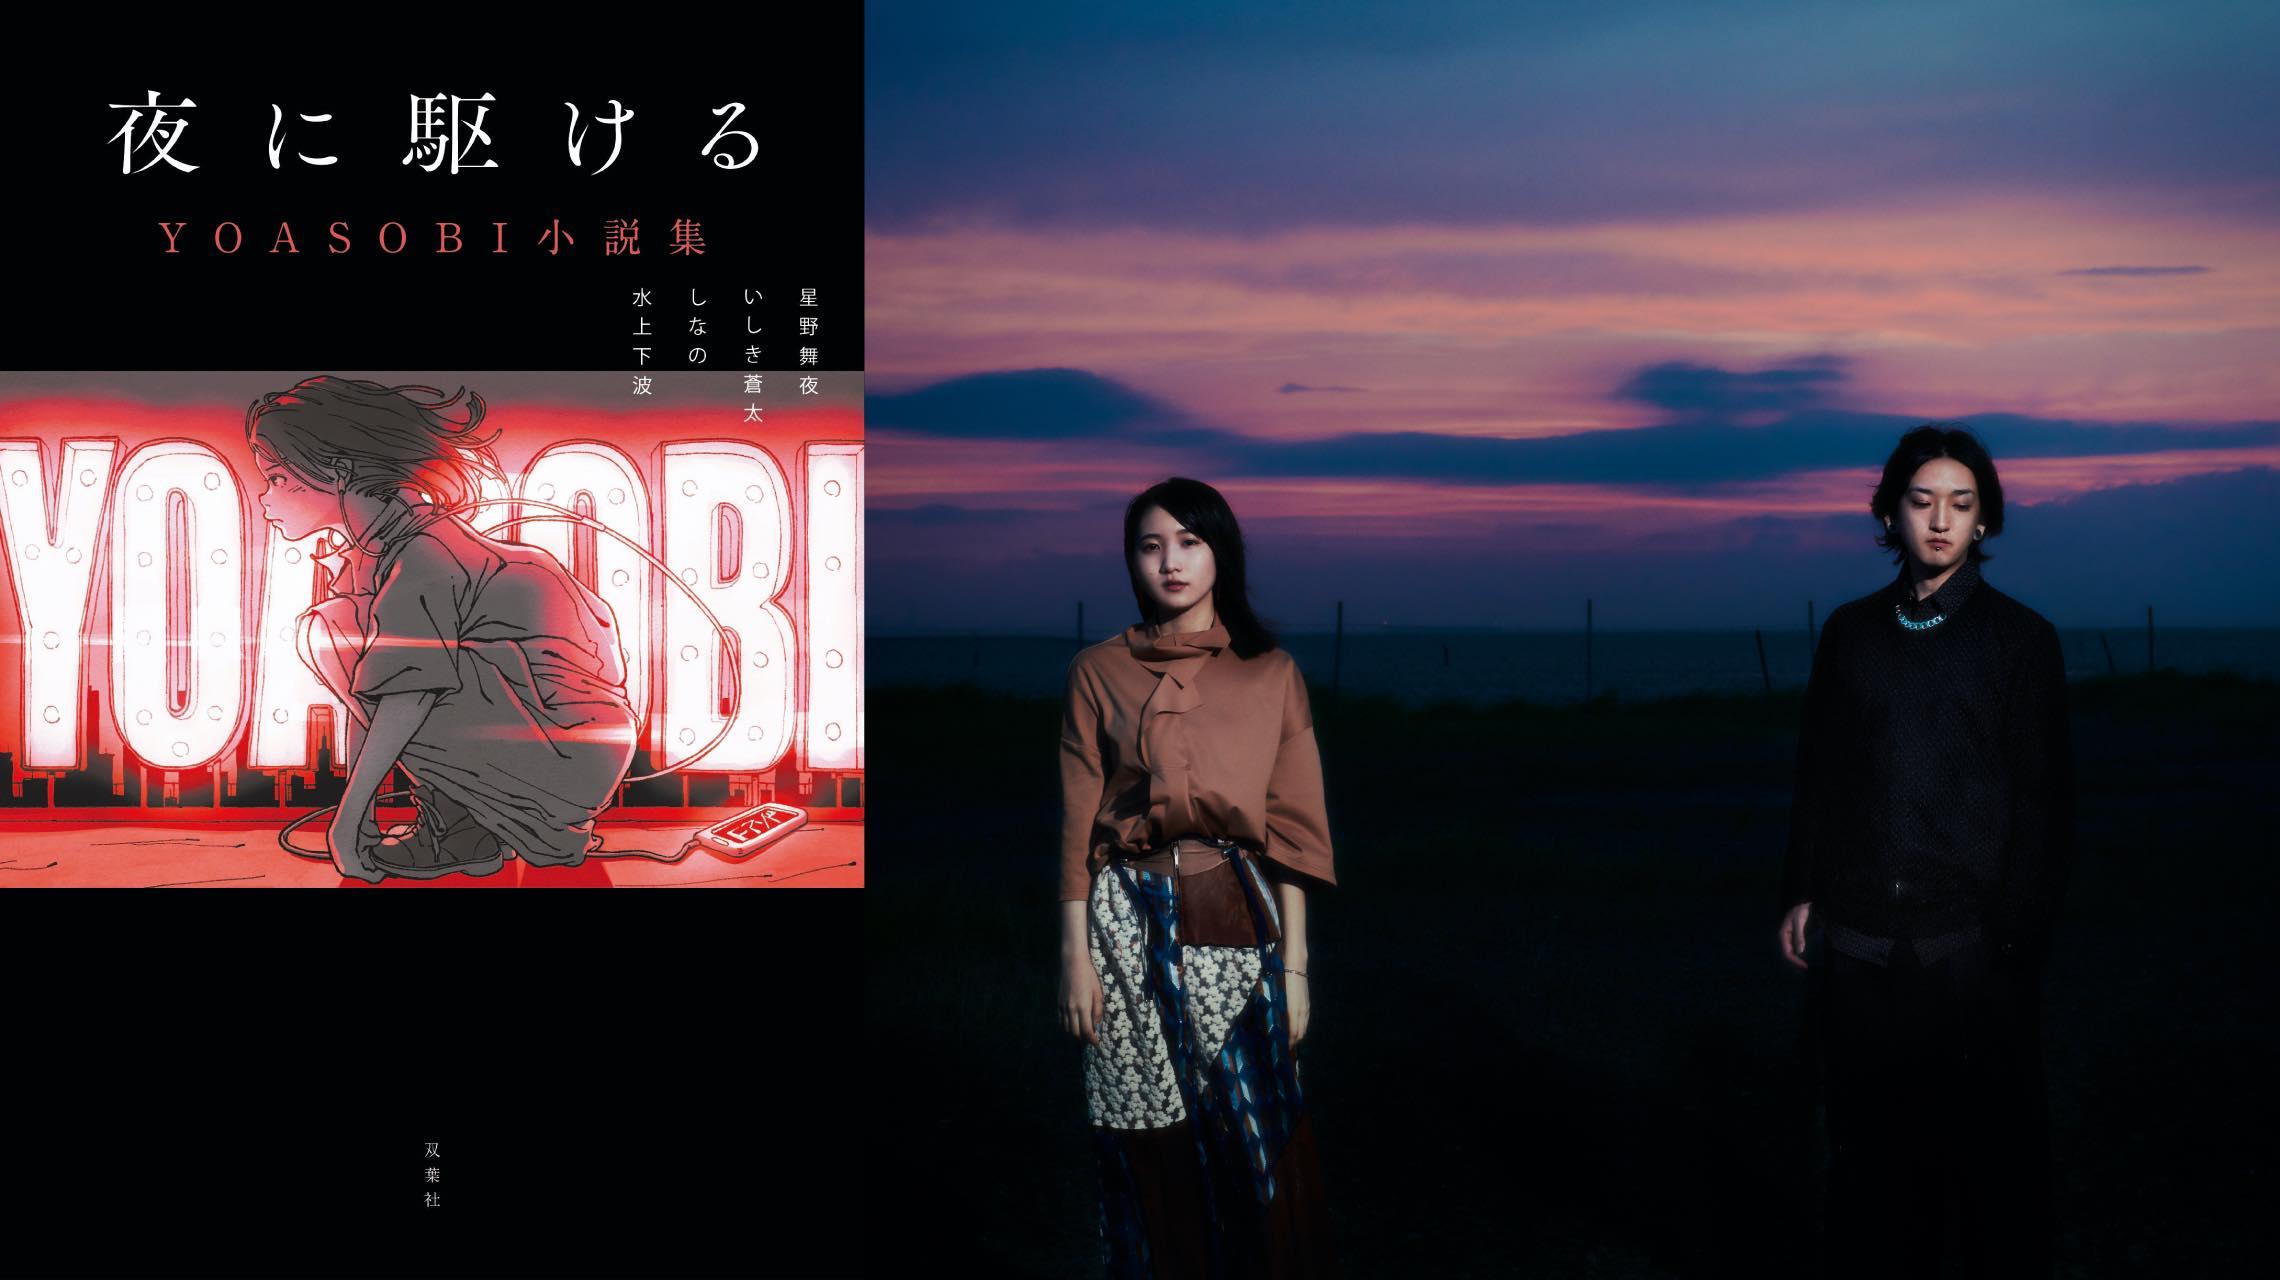 YOASOBIの楽曲の元ネタを収録した『夜に駆ける YOASOBI小説集』